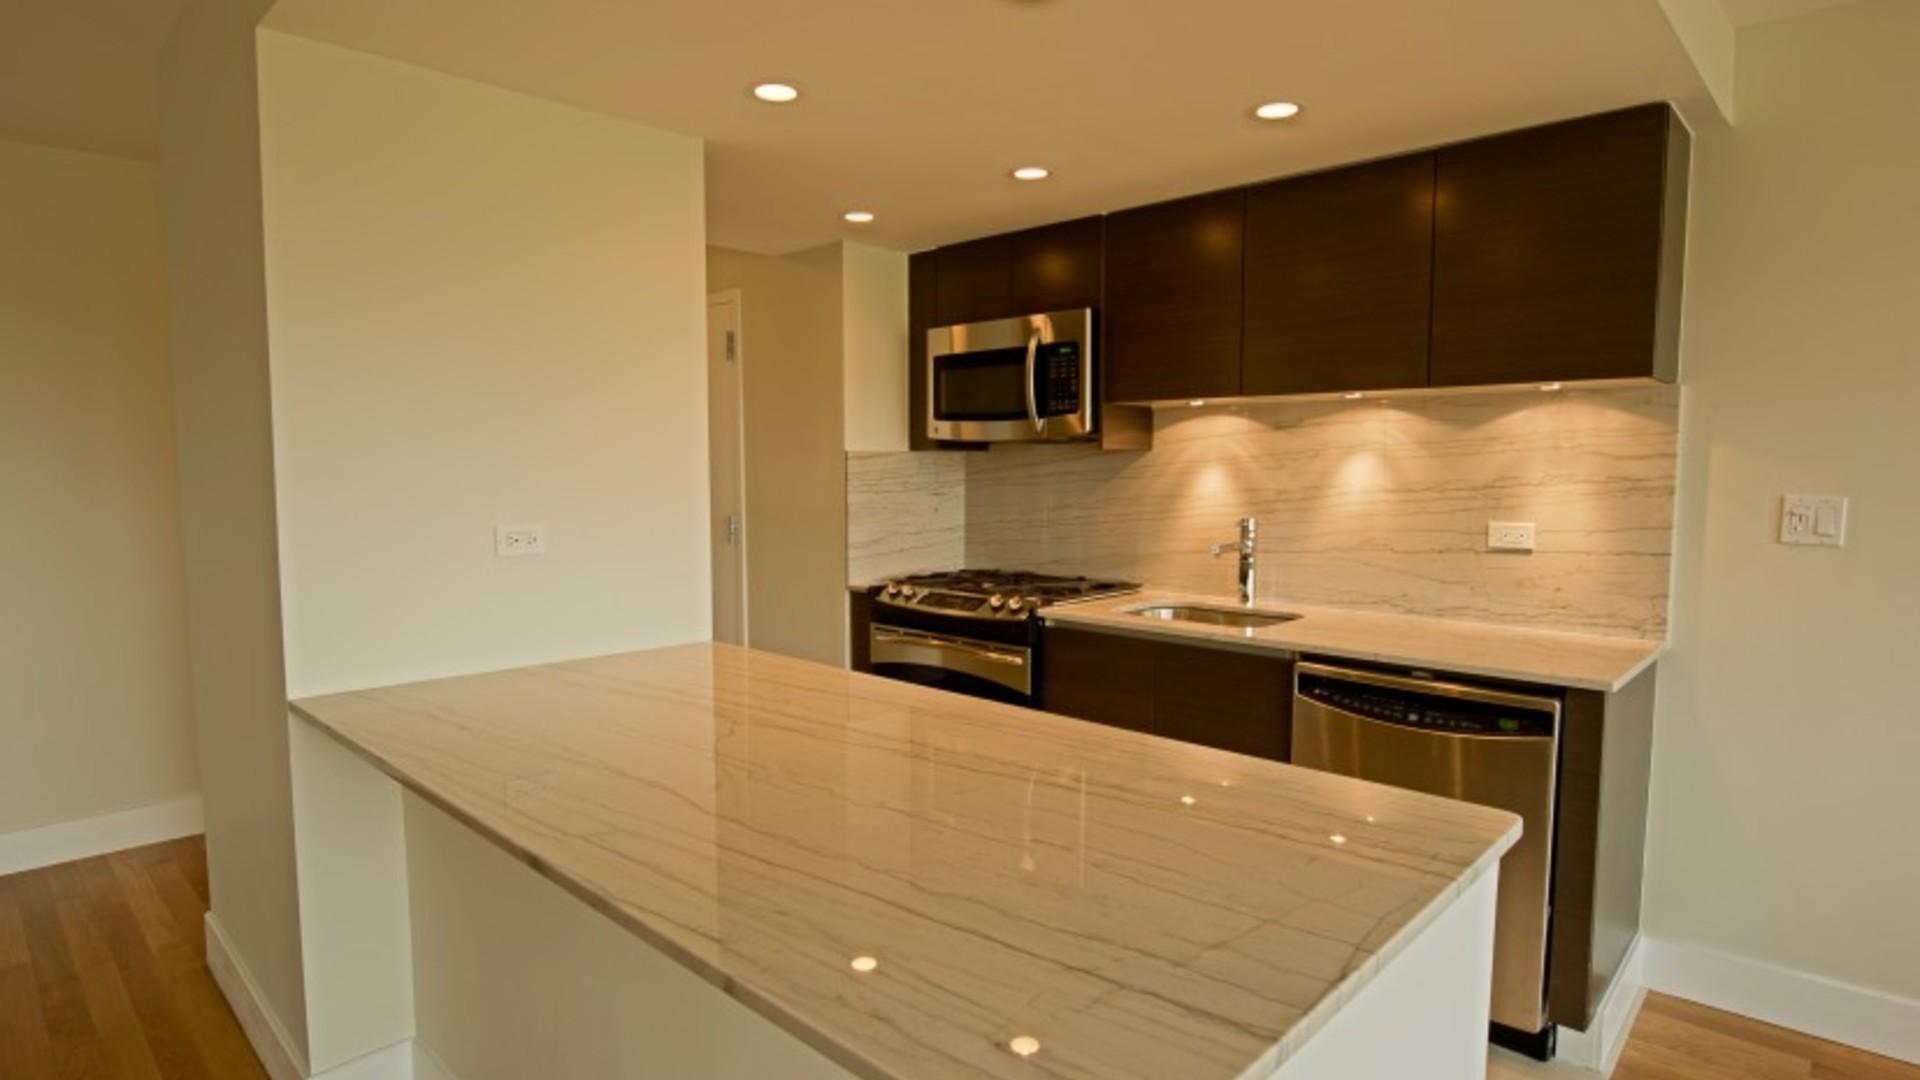 A 5225 Apartment In Upper West Side Manhattan Nooklyn